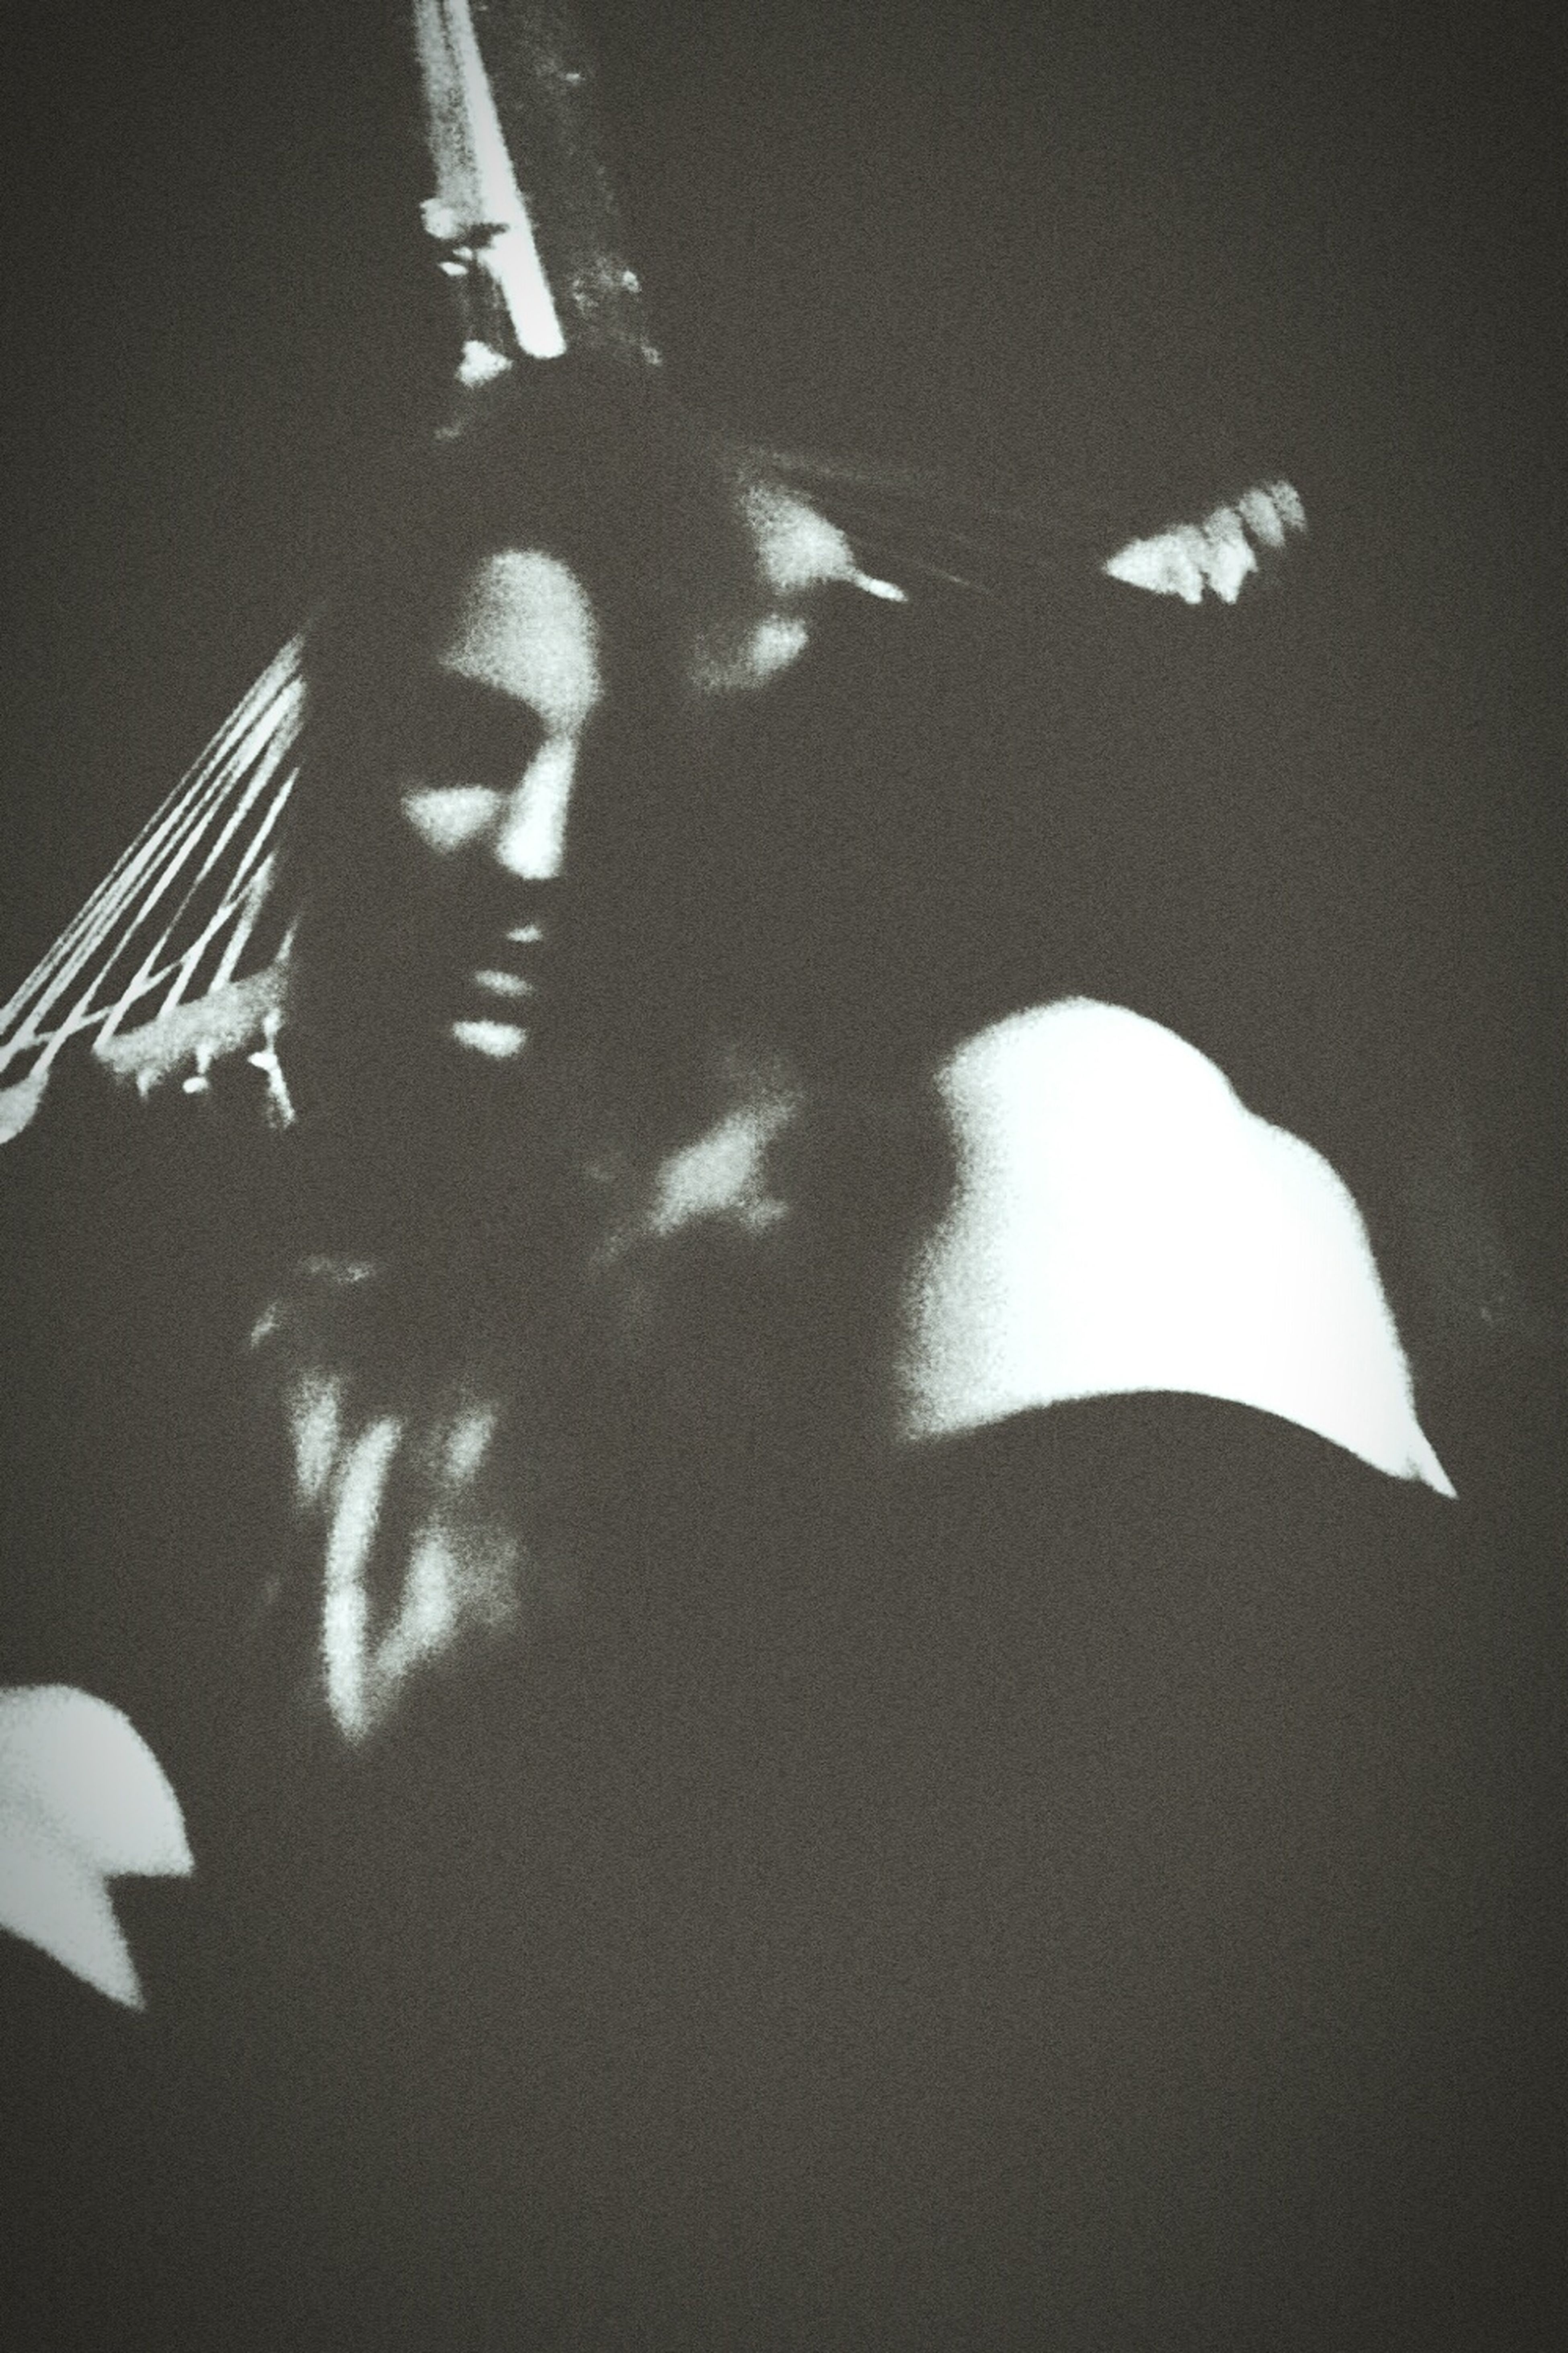 Dark Photography Hammocktime That's Me Withaleg